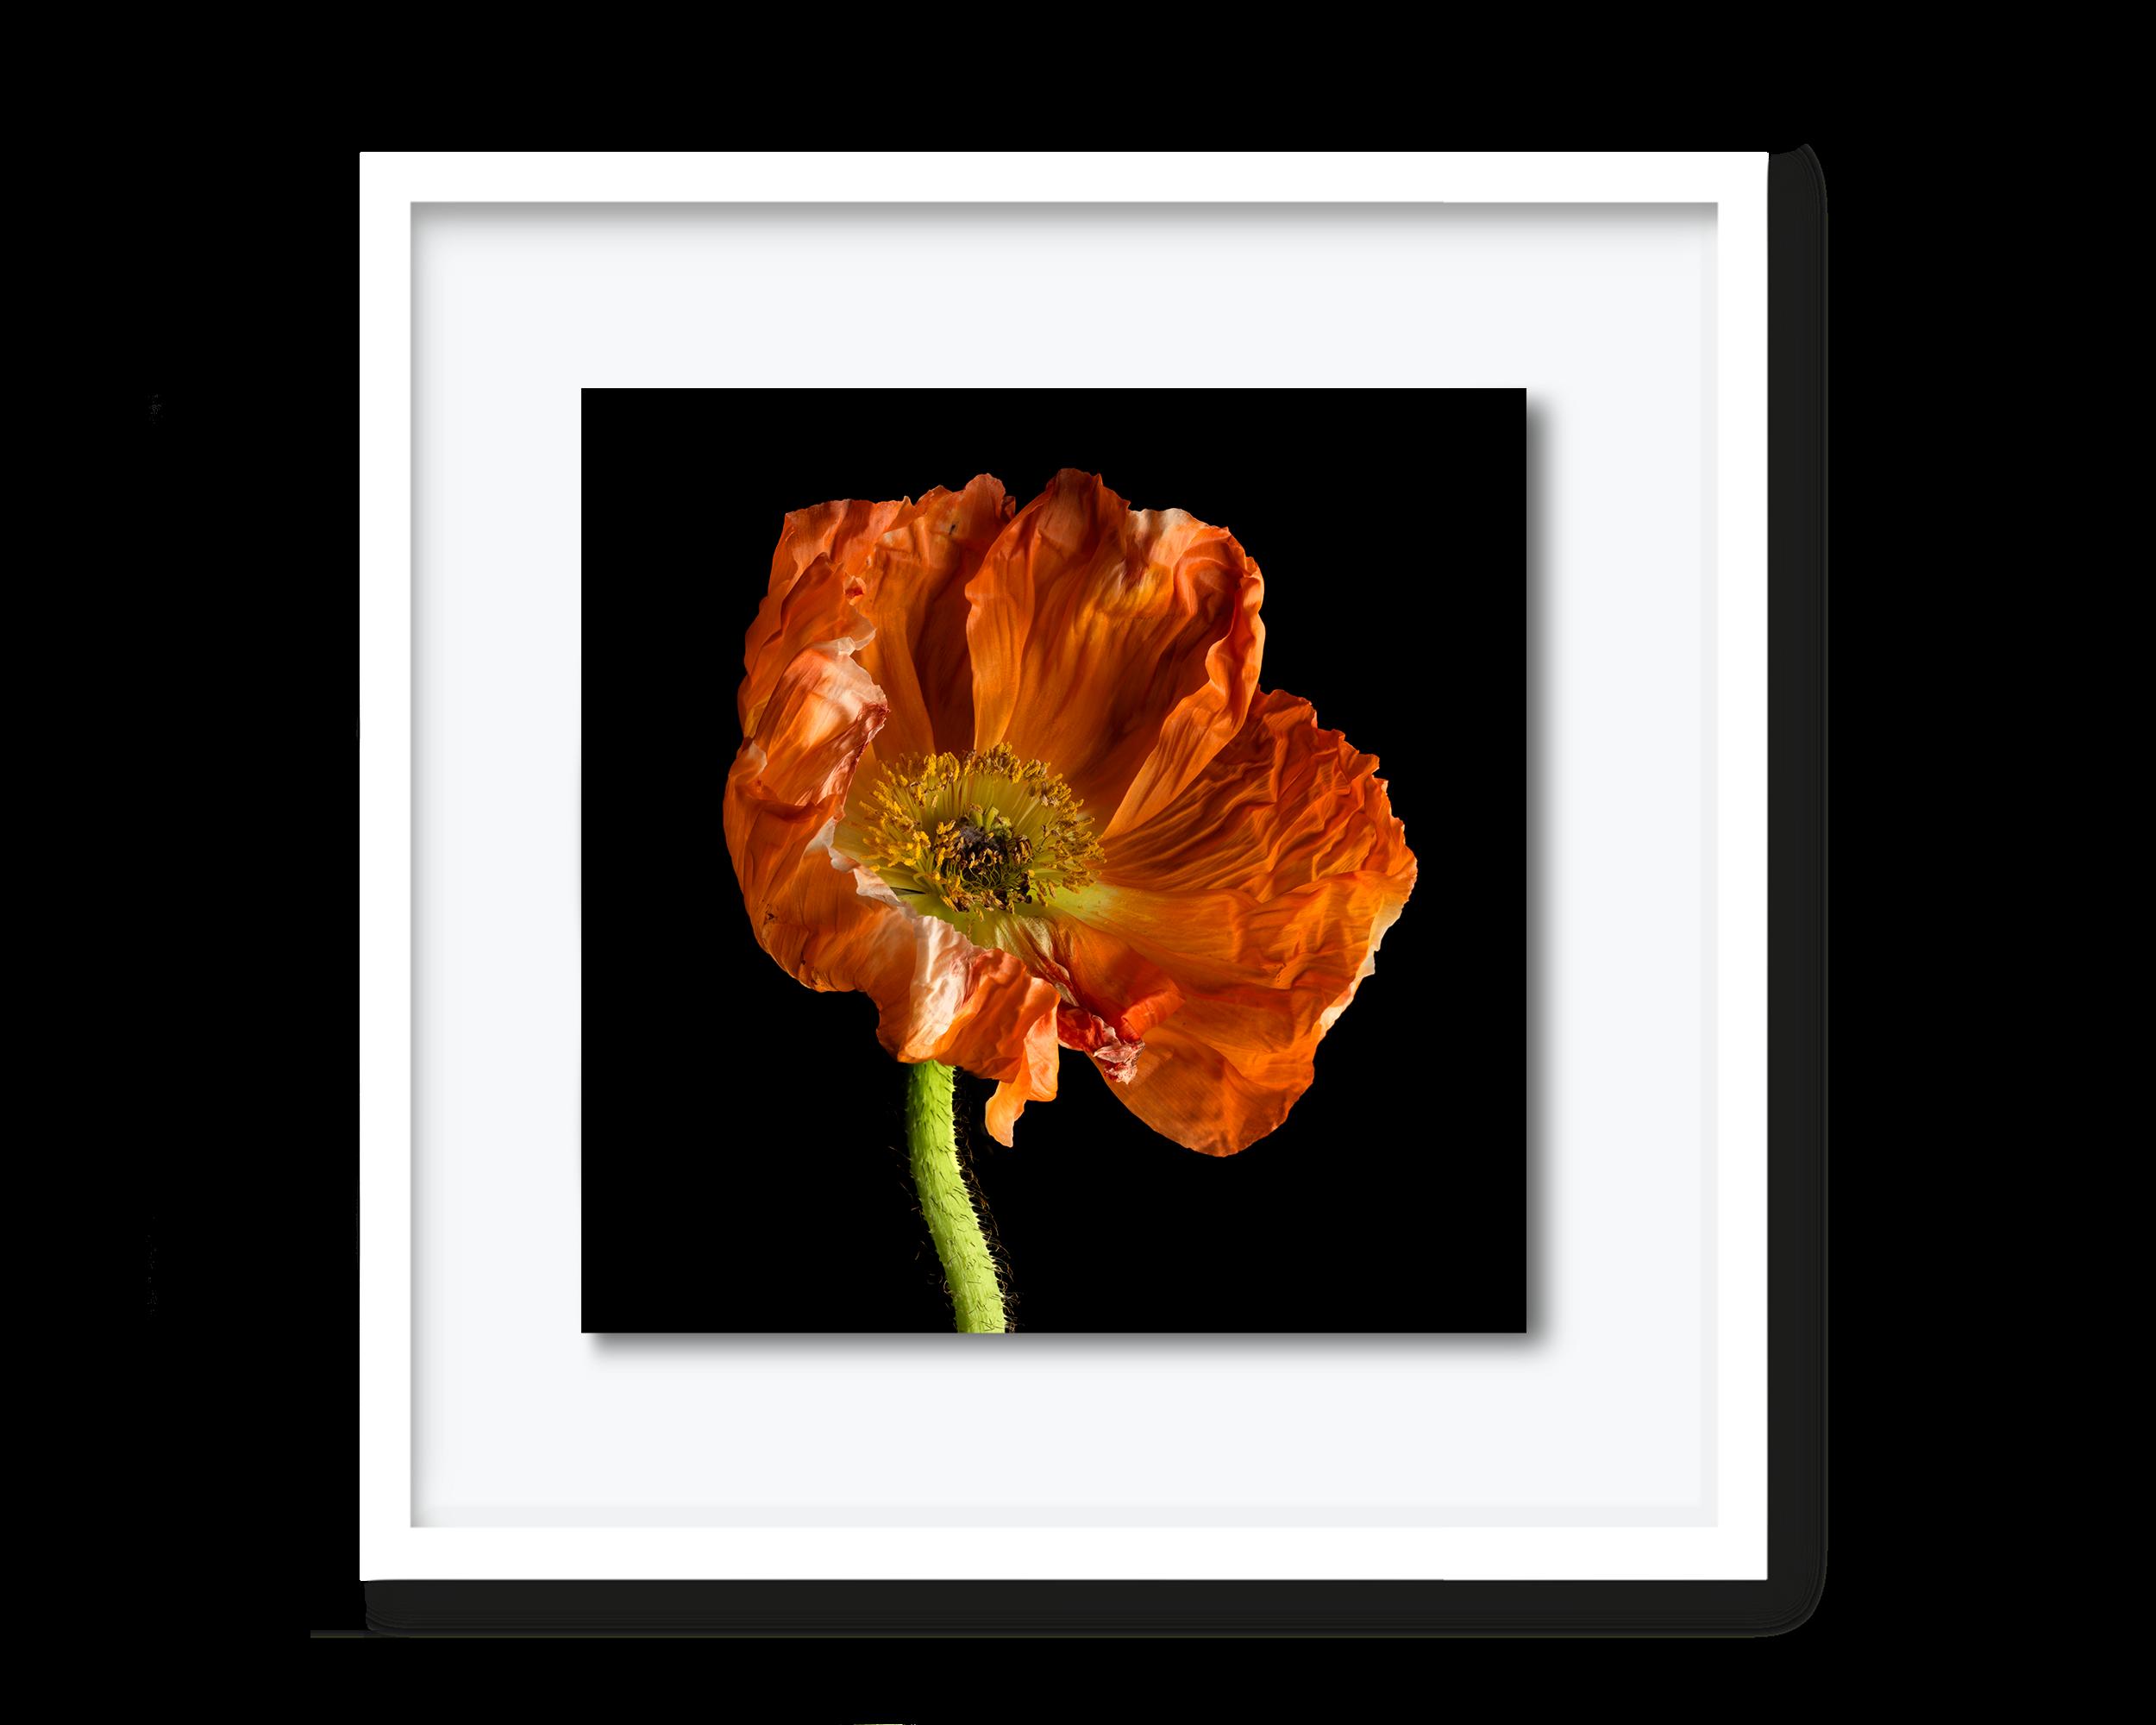 60.david-pearce-poppy.png